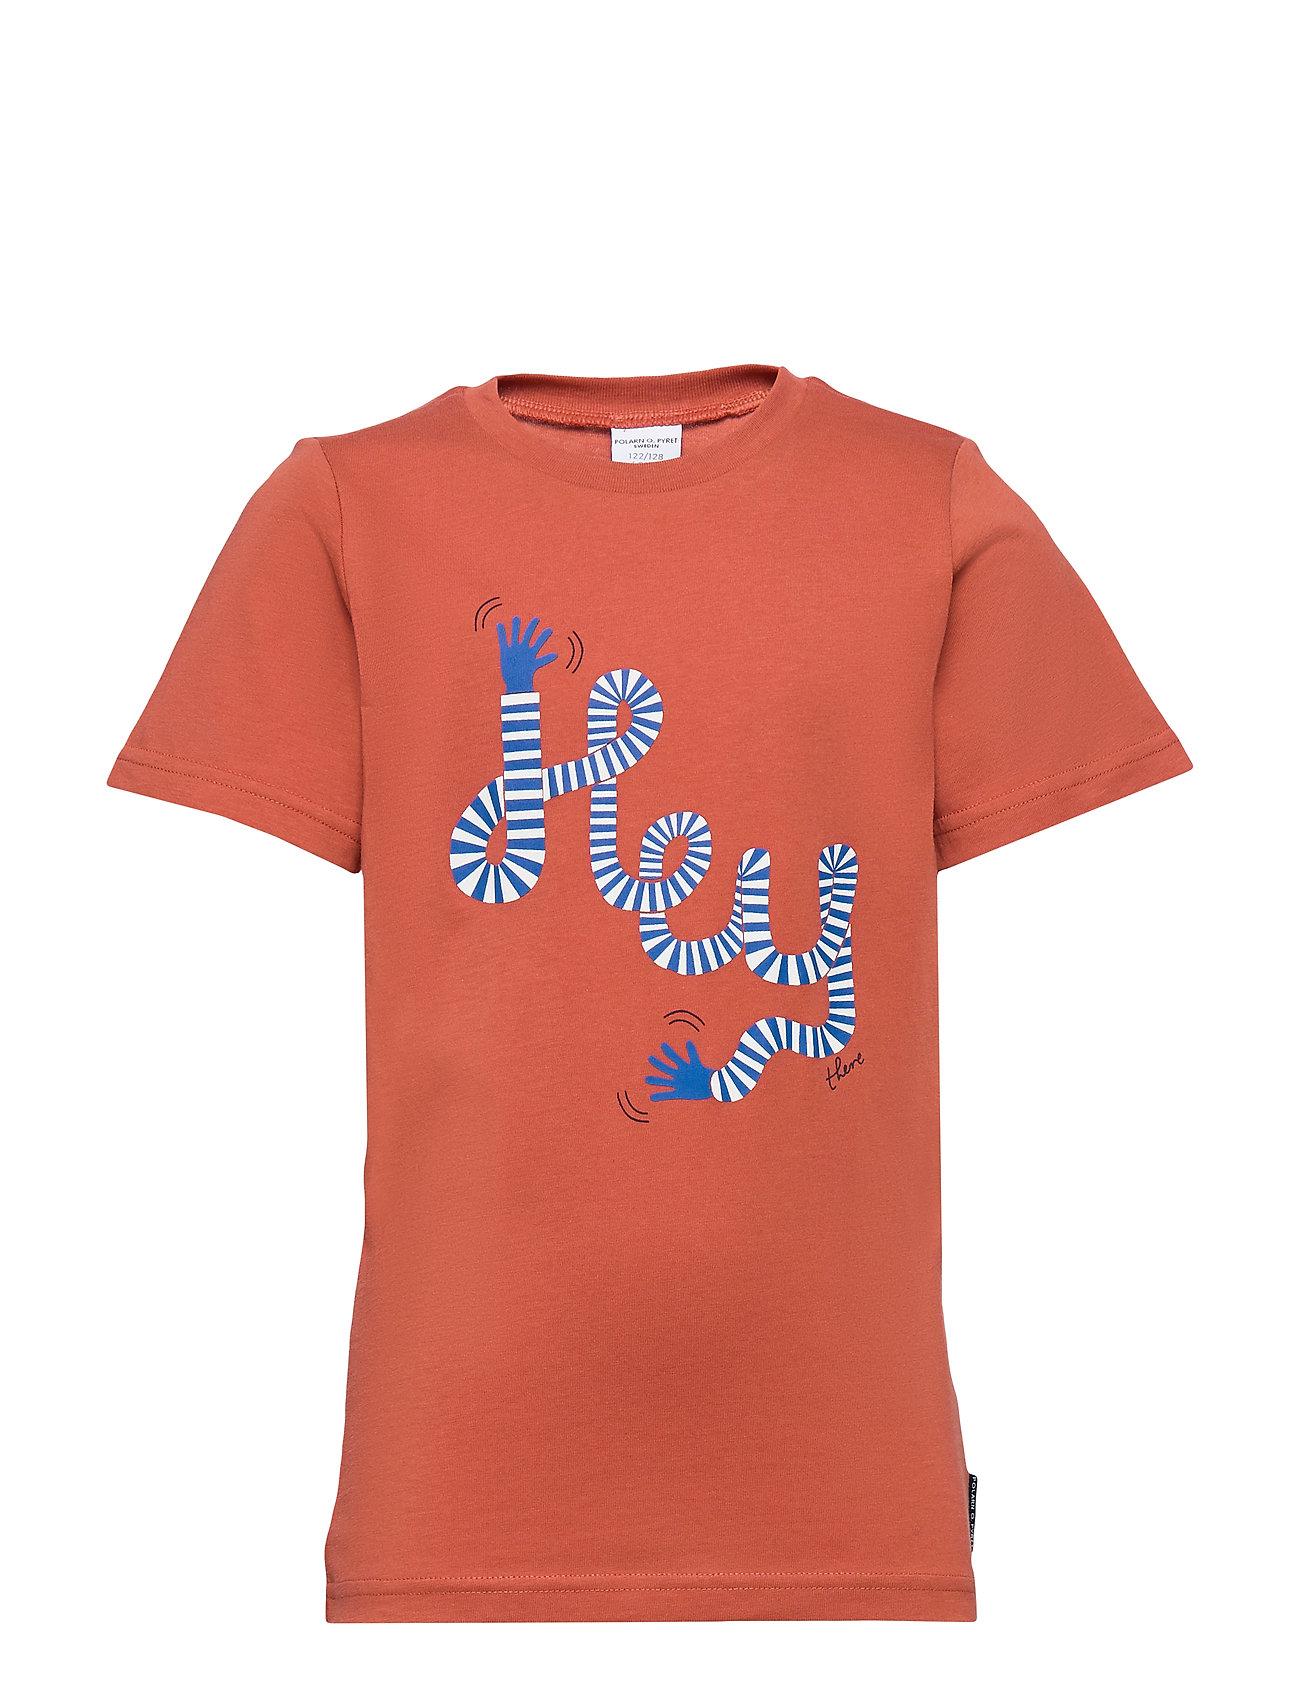 Polarn O. Pyret T-shirt Frontprint s/s School - REDWOOD